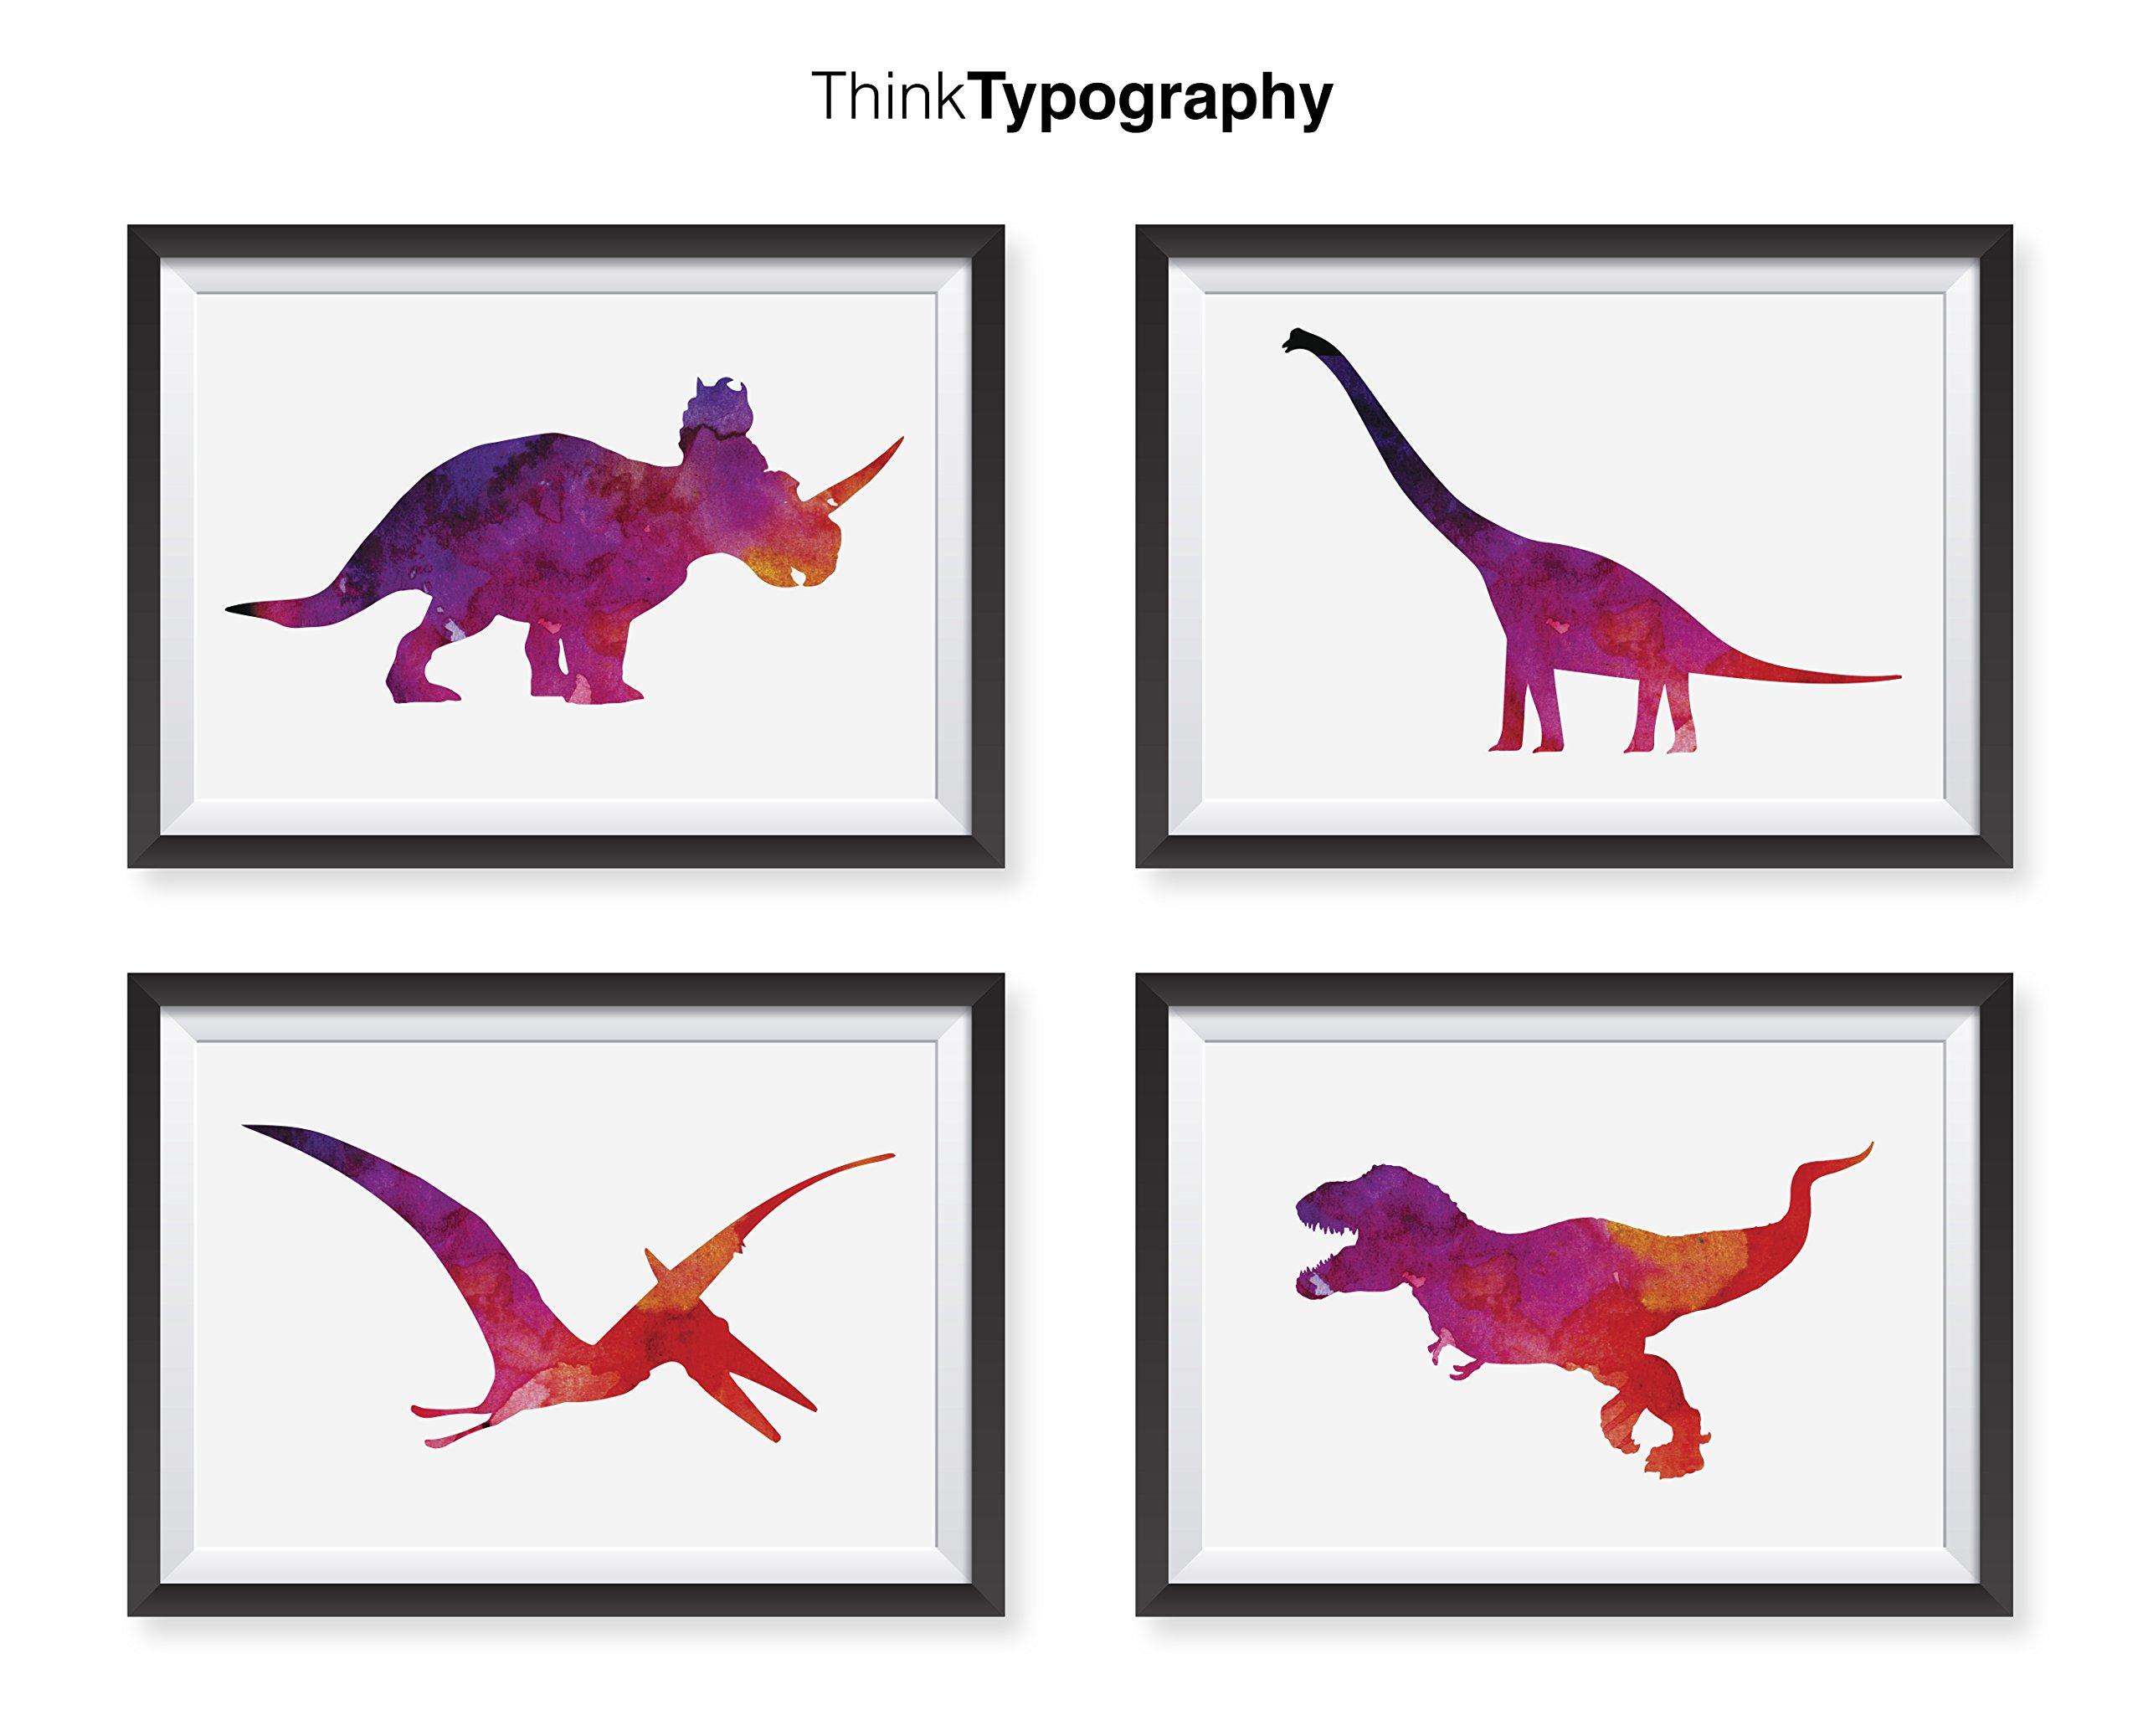 Dinosaurs Pink Frames, Nursery Art Print, Minimalist Poster, Home Decor, College Dorm Room Decorations, Wall Art